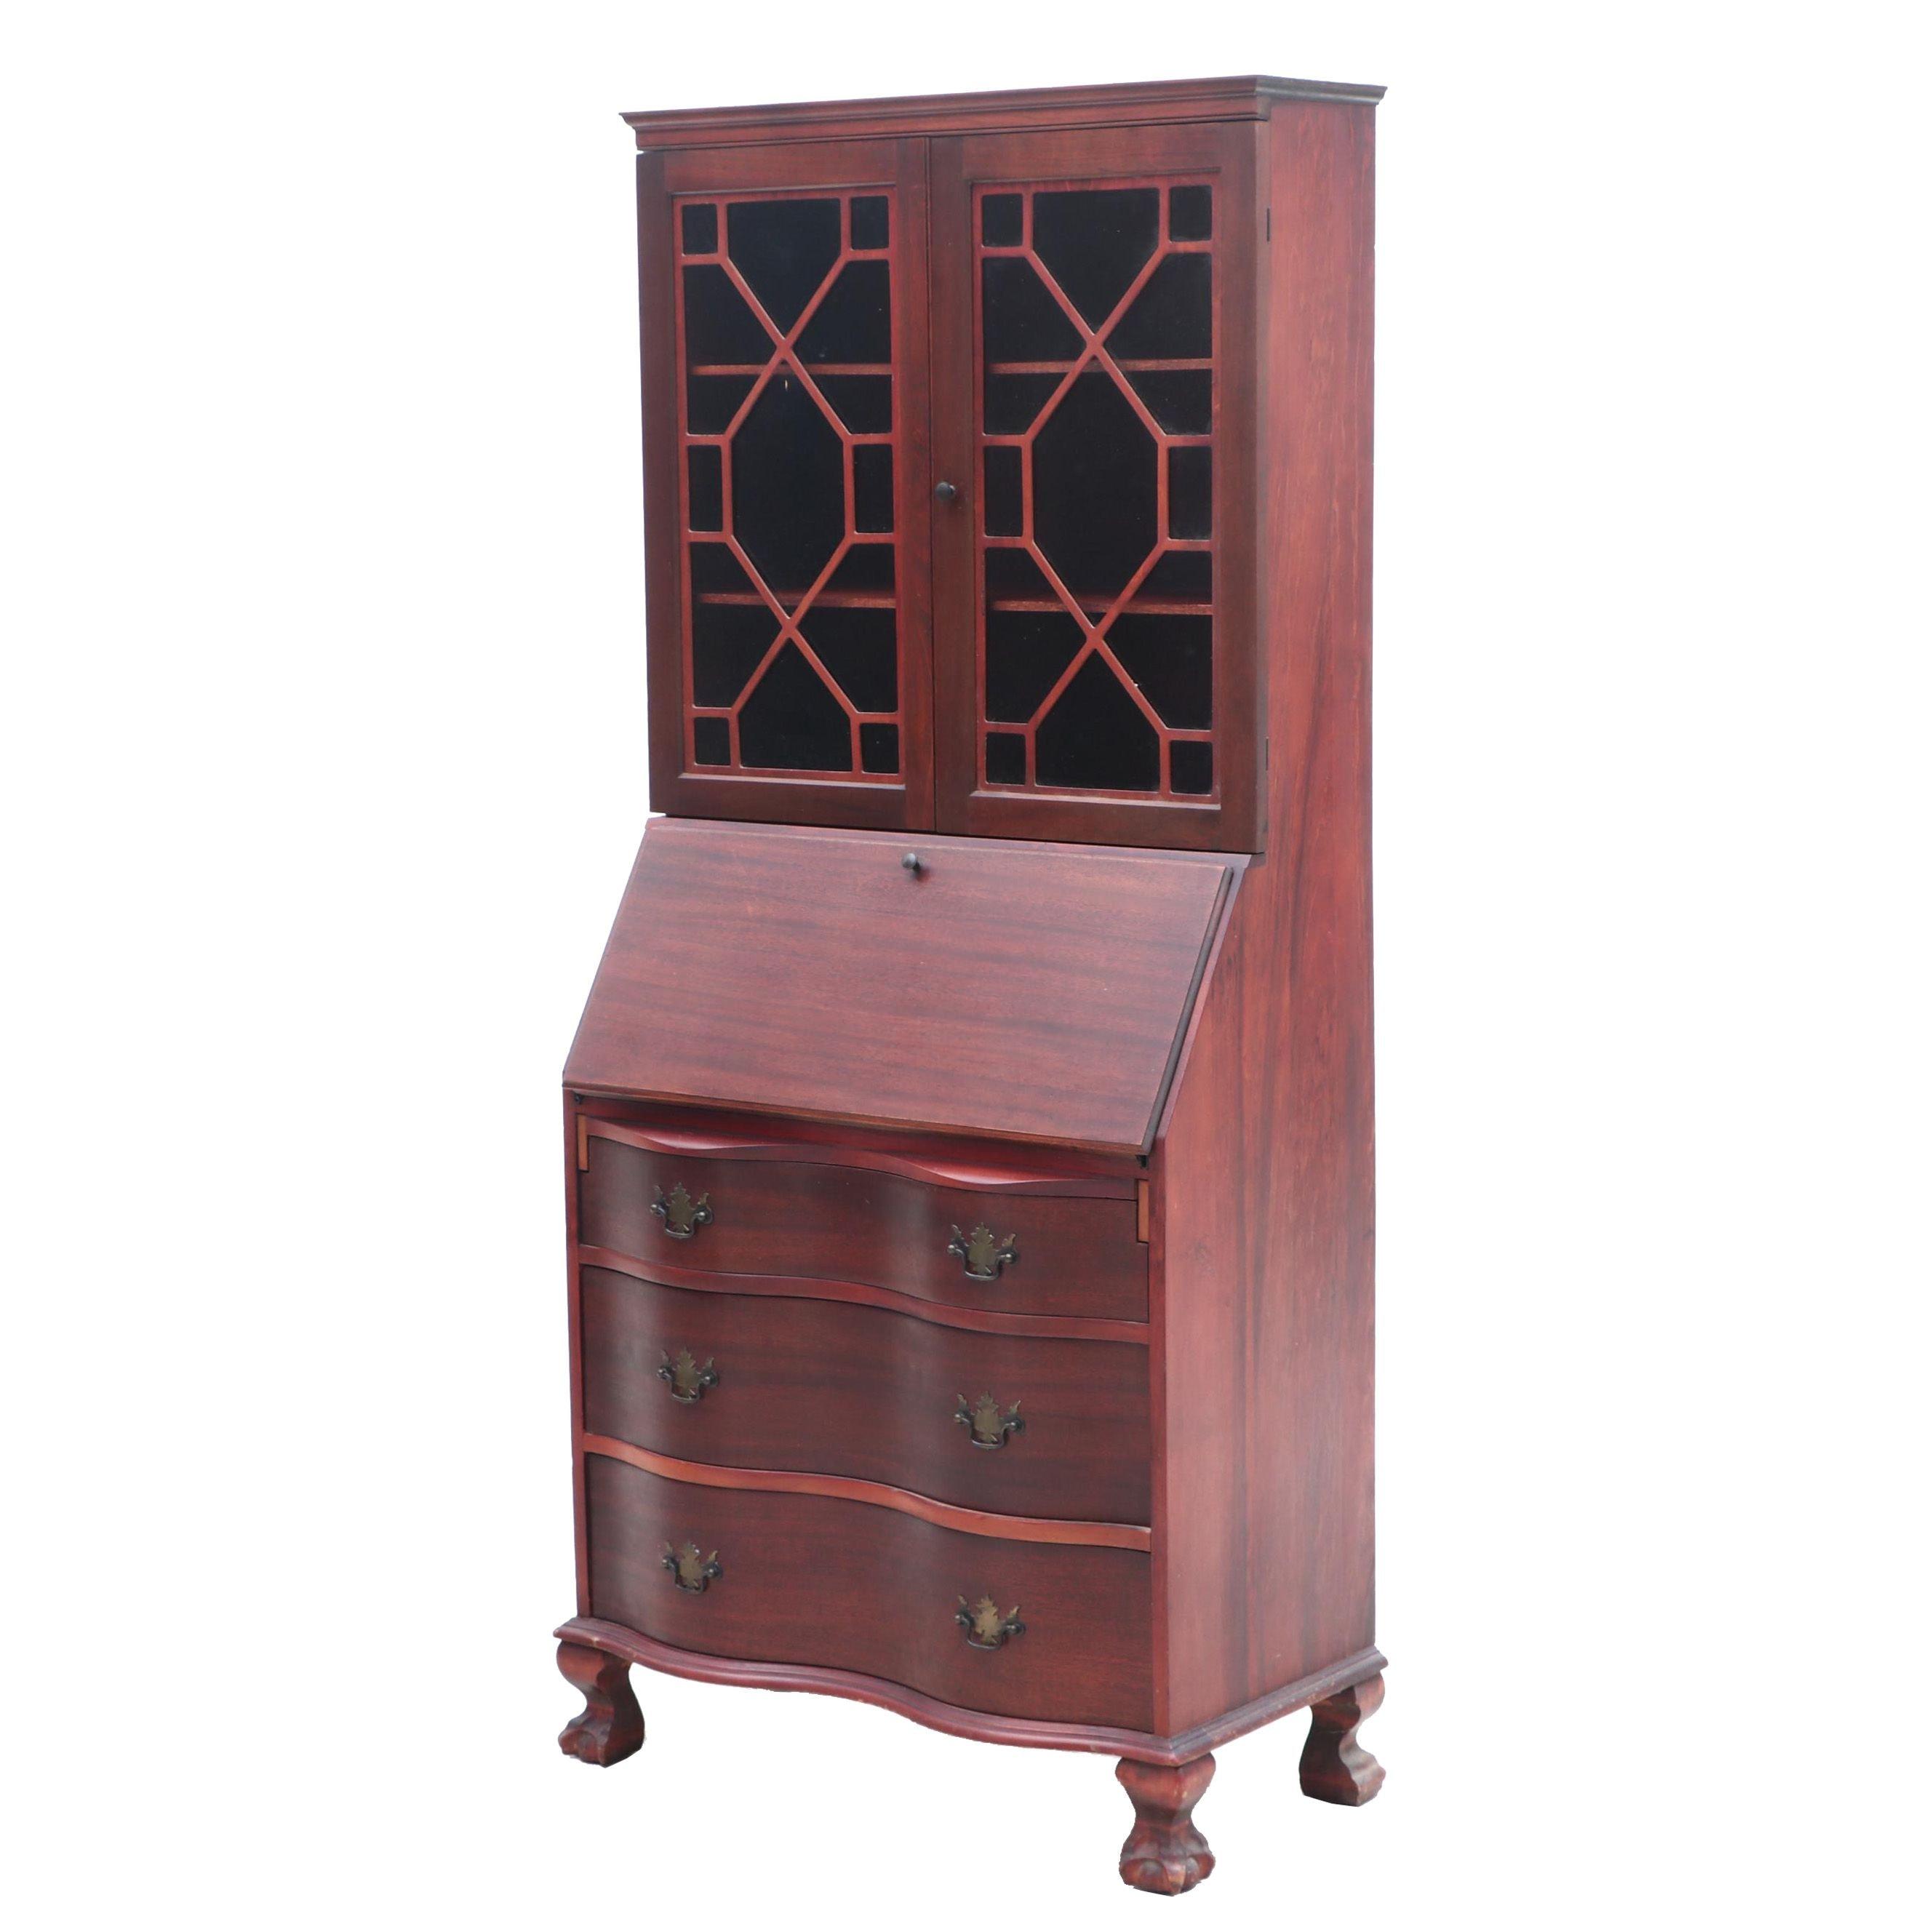 Chippendale Style R.I. Blauser & Sons Mahogany Secretary Bookcase, Circa 1940s